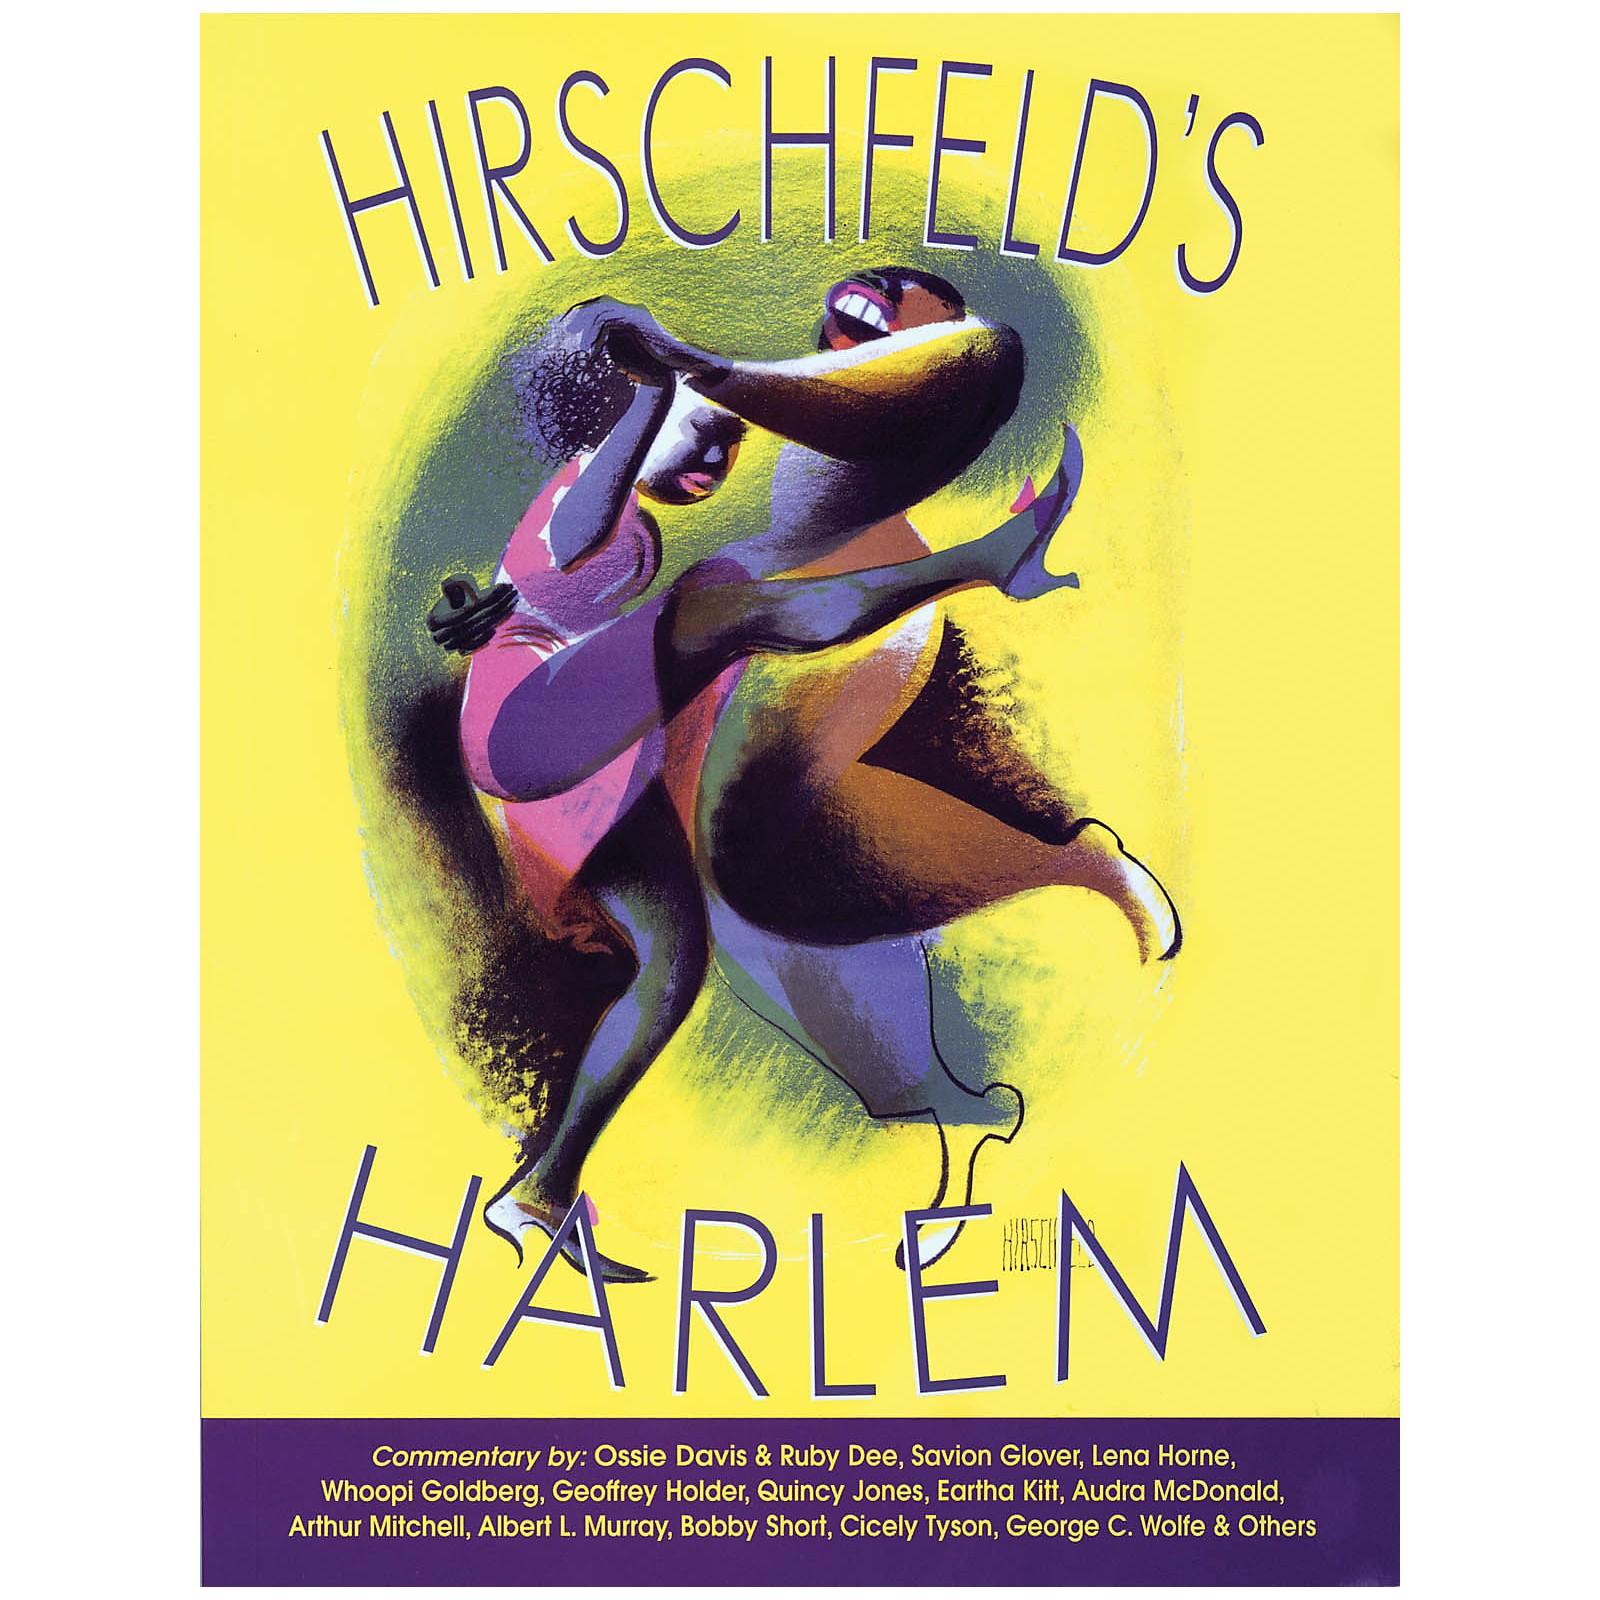 Glenn Young Books/Applause Hirschfeld's Harlem Applause Books Series Softcover Written by Al Hirschfeld